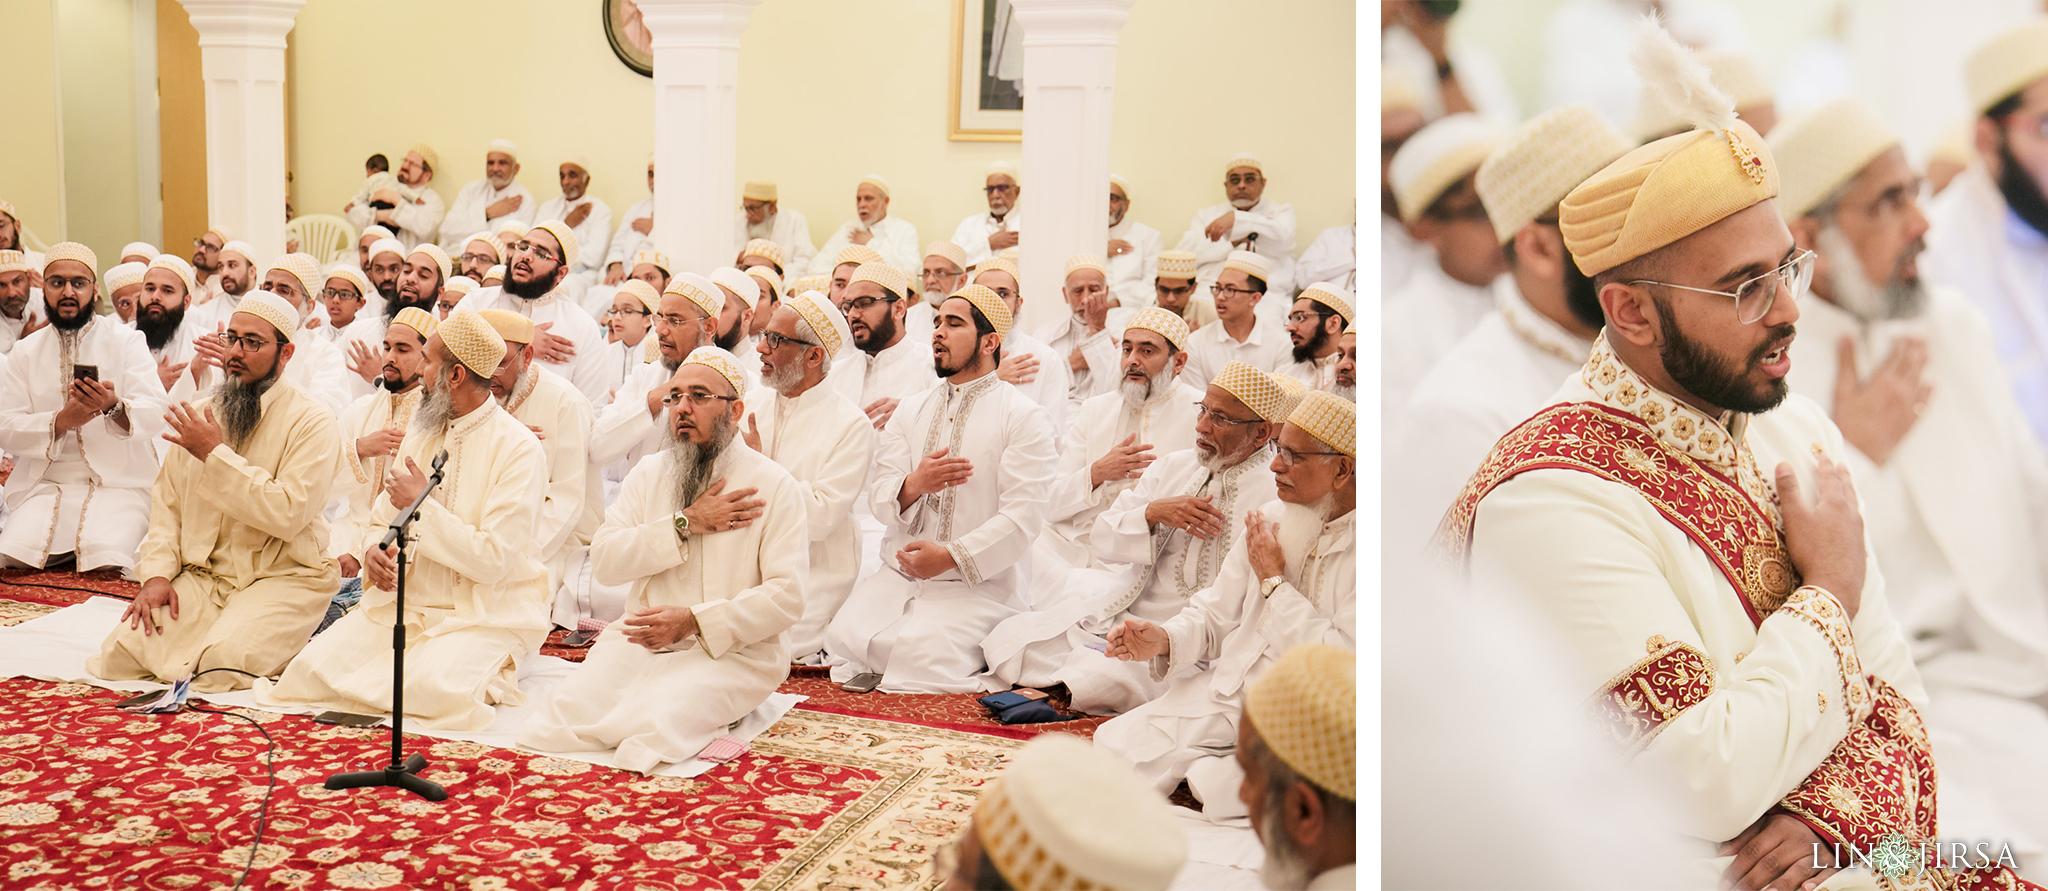 09 Jamali Masjid Ontario Shia Muslim Nikah Photography